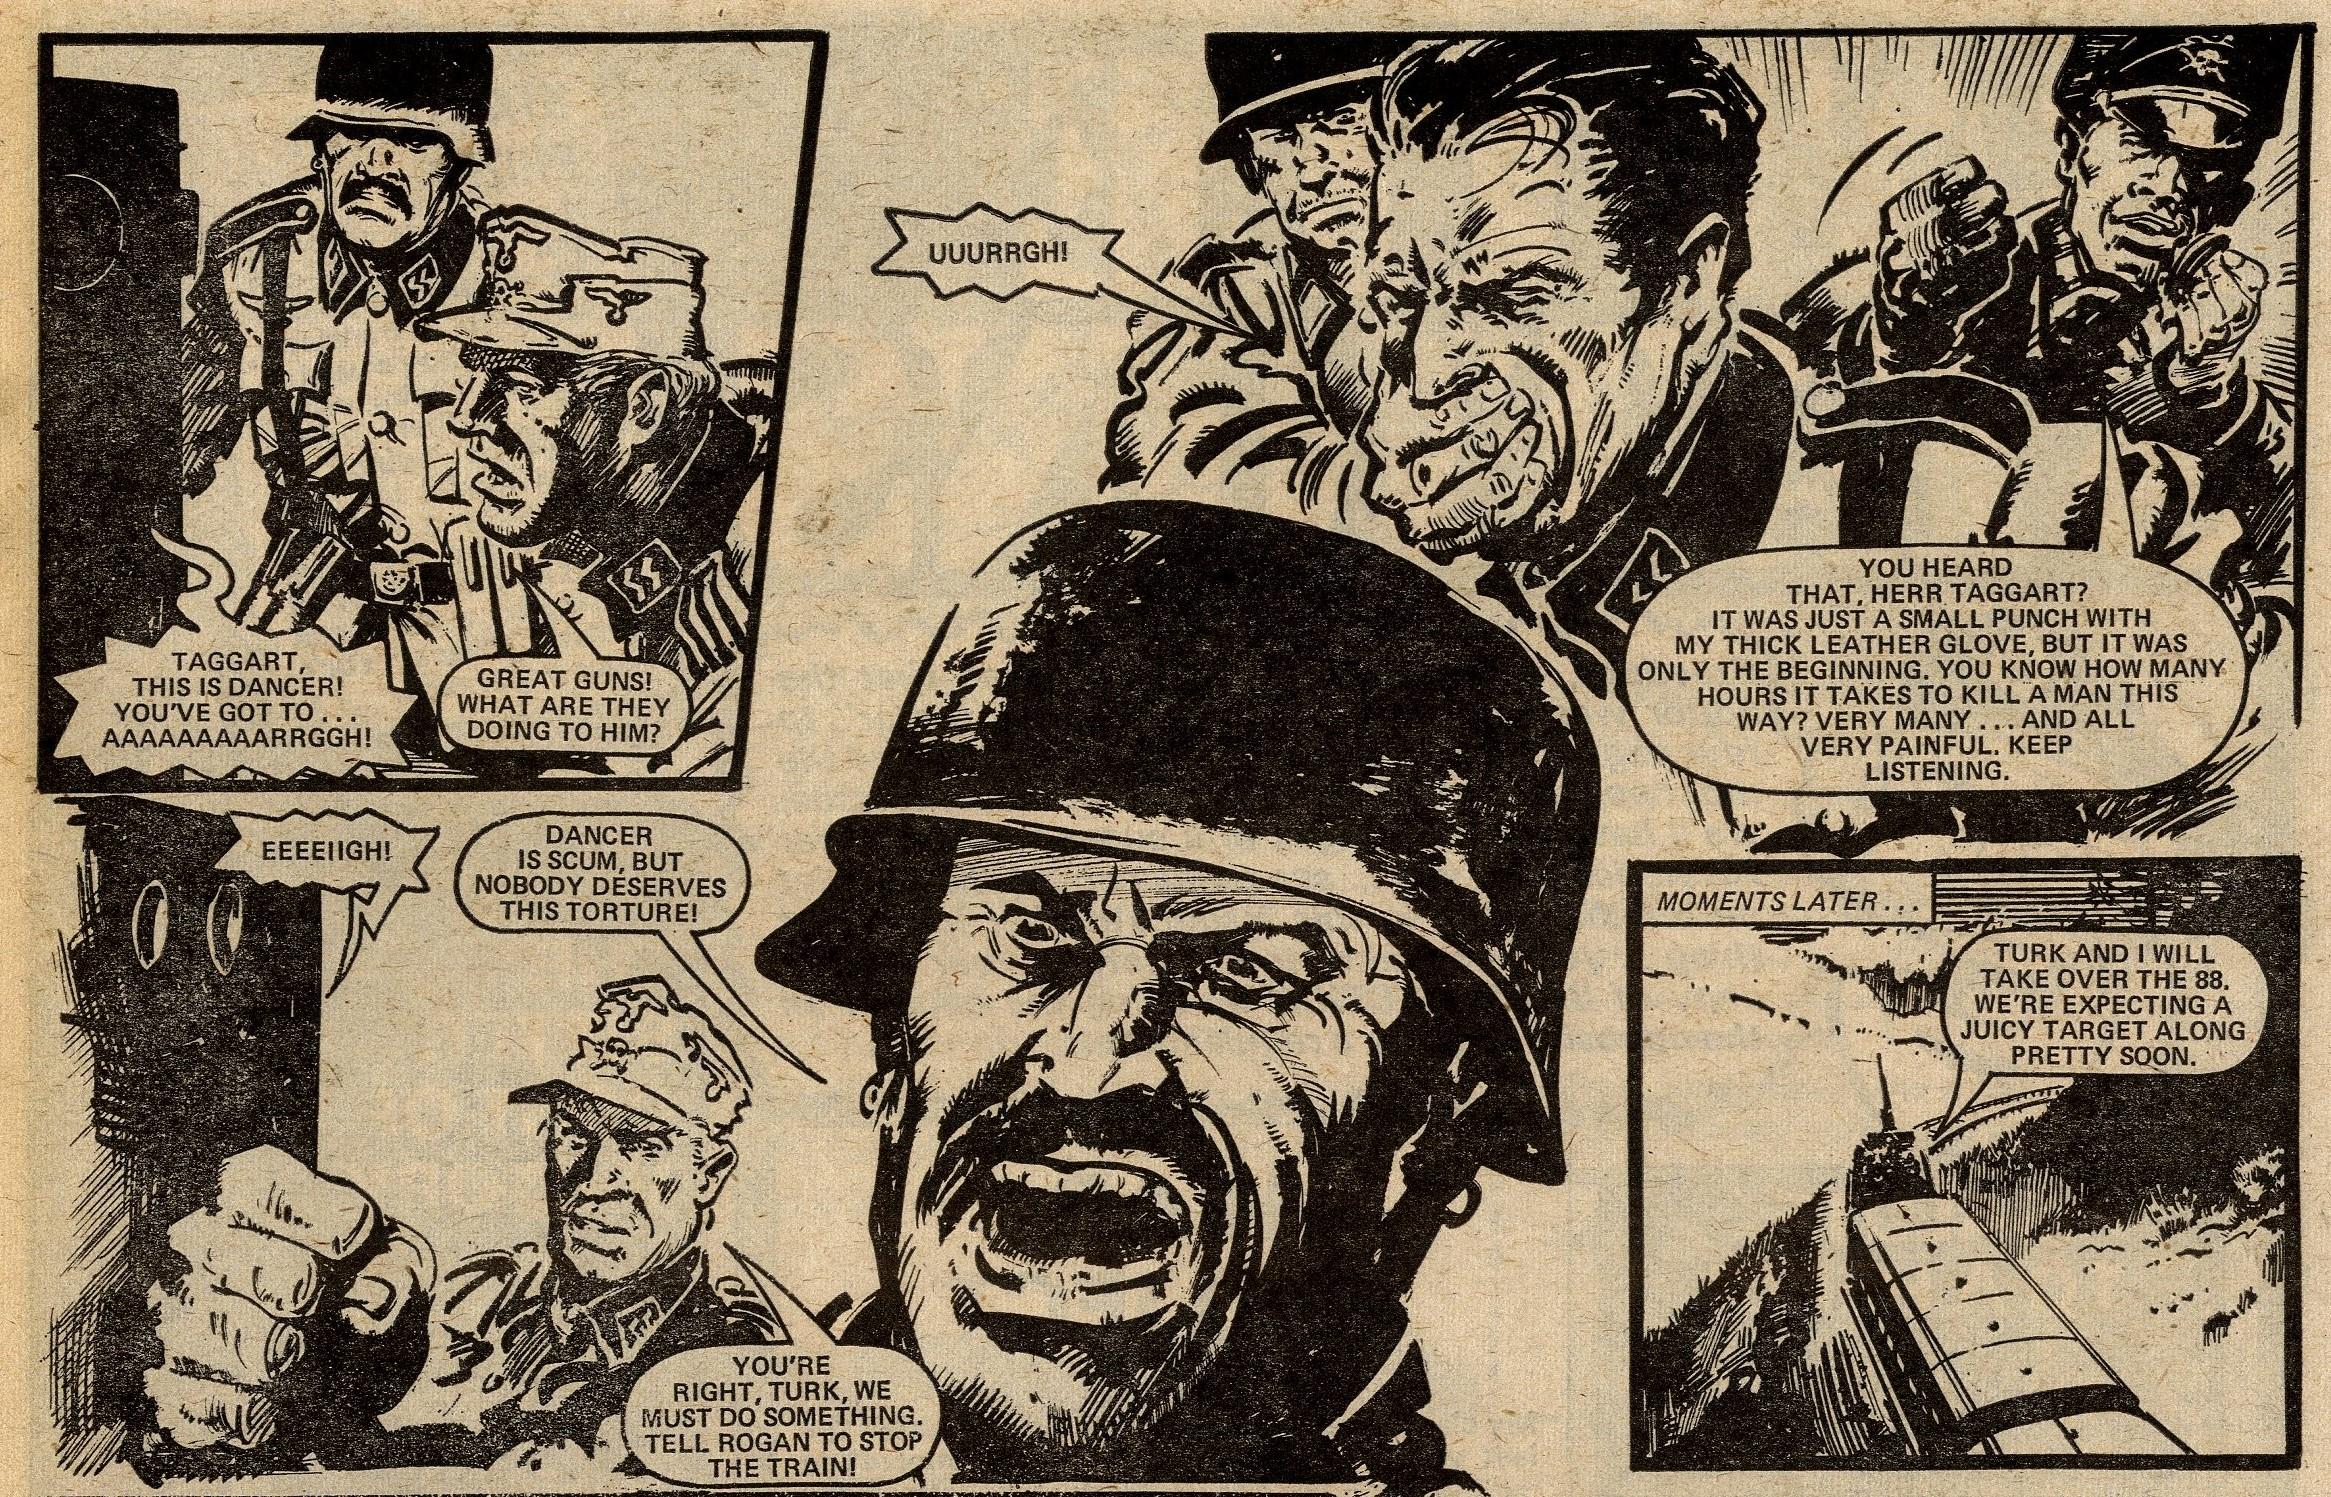 Rat Pack: writer unknown, Eric Bradbury (artist)